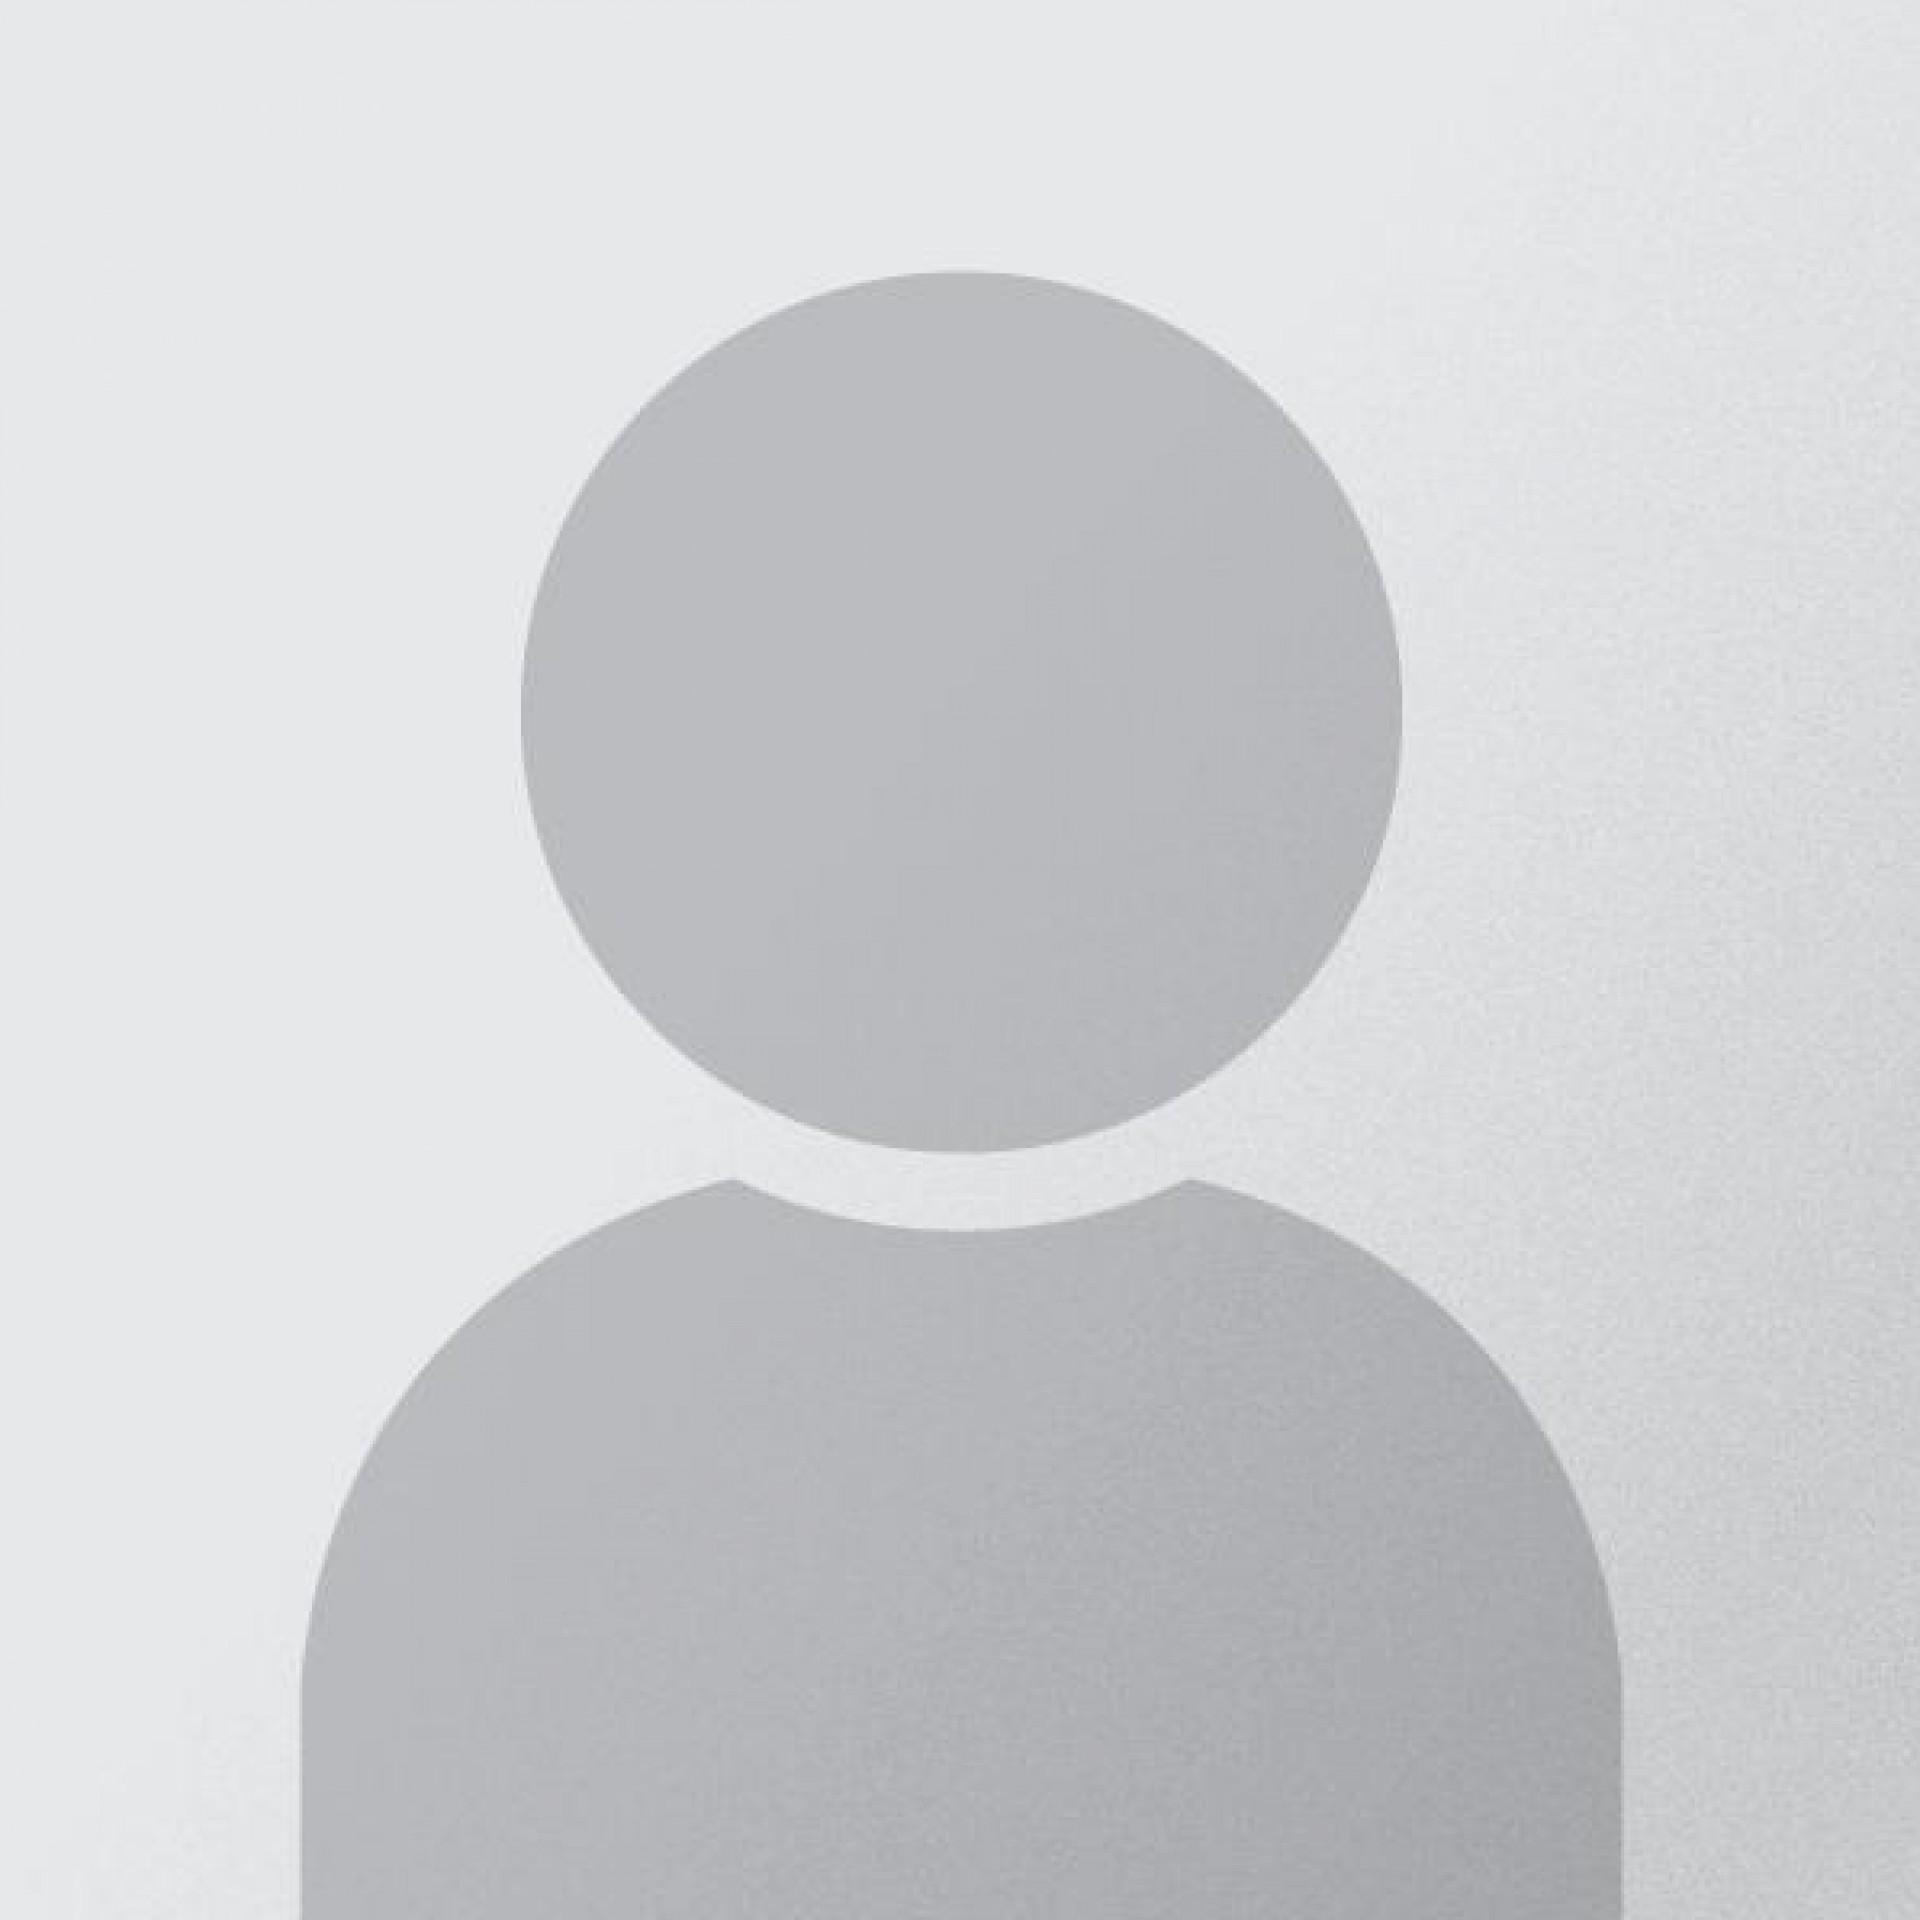 fotografia p021 profilu 01021R5UV1